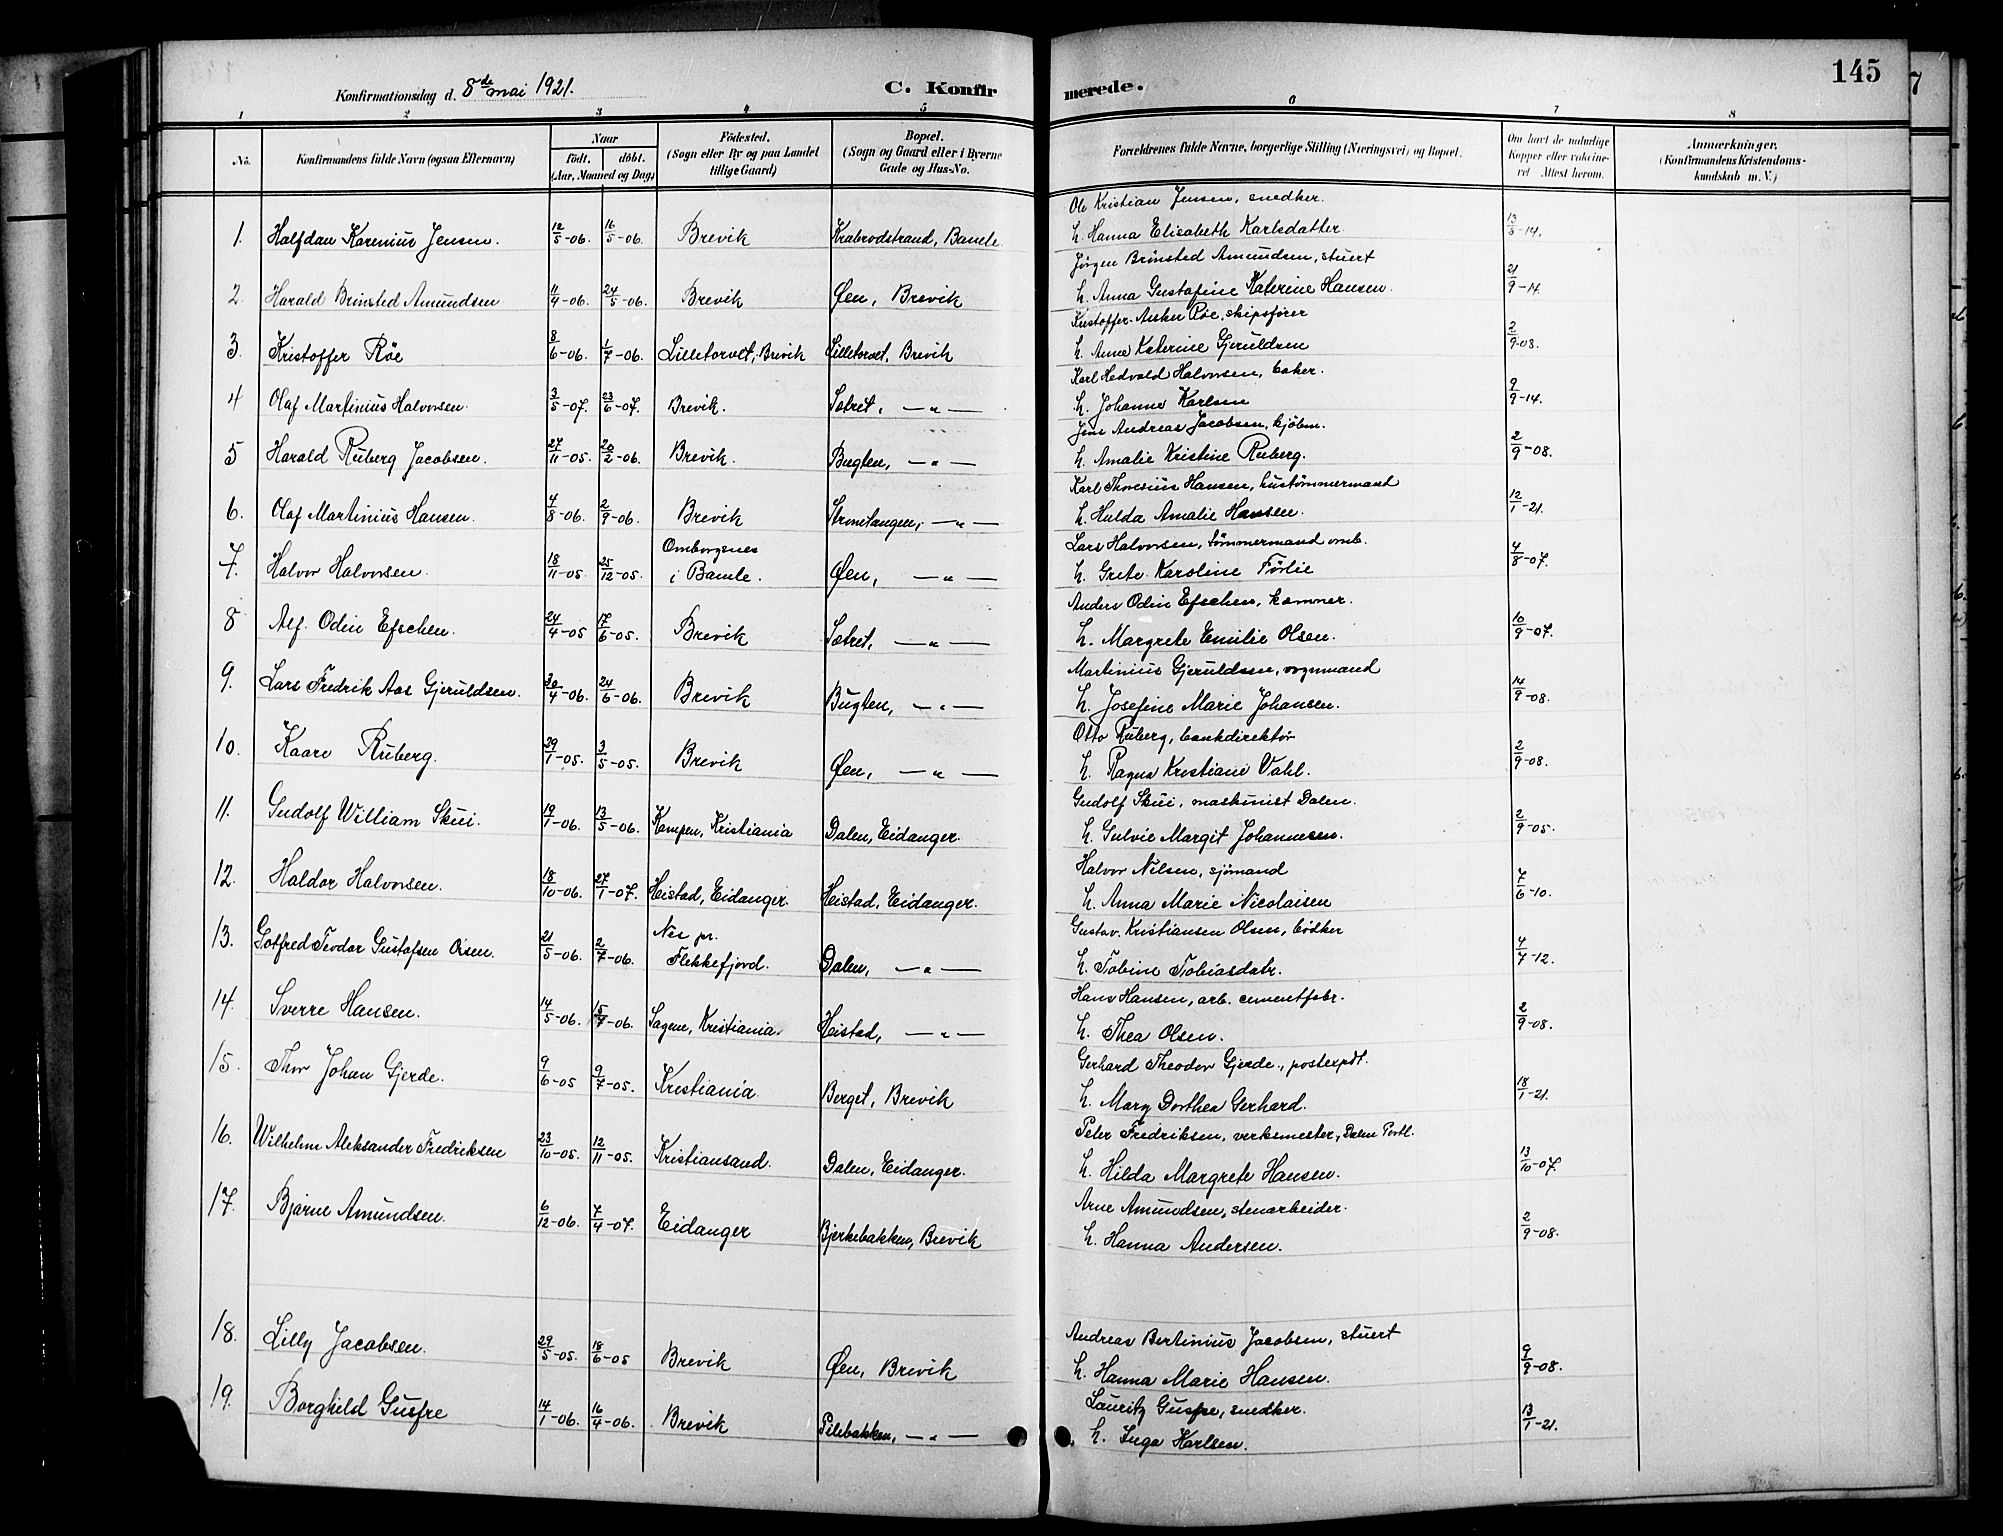 SAKO, Brevik kirkebøker, G/Ga/L0005: Klokkerbok nr. 5, 1901-1924, s. 145